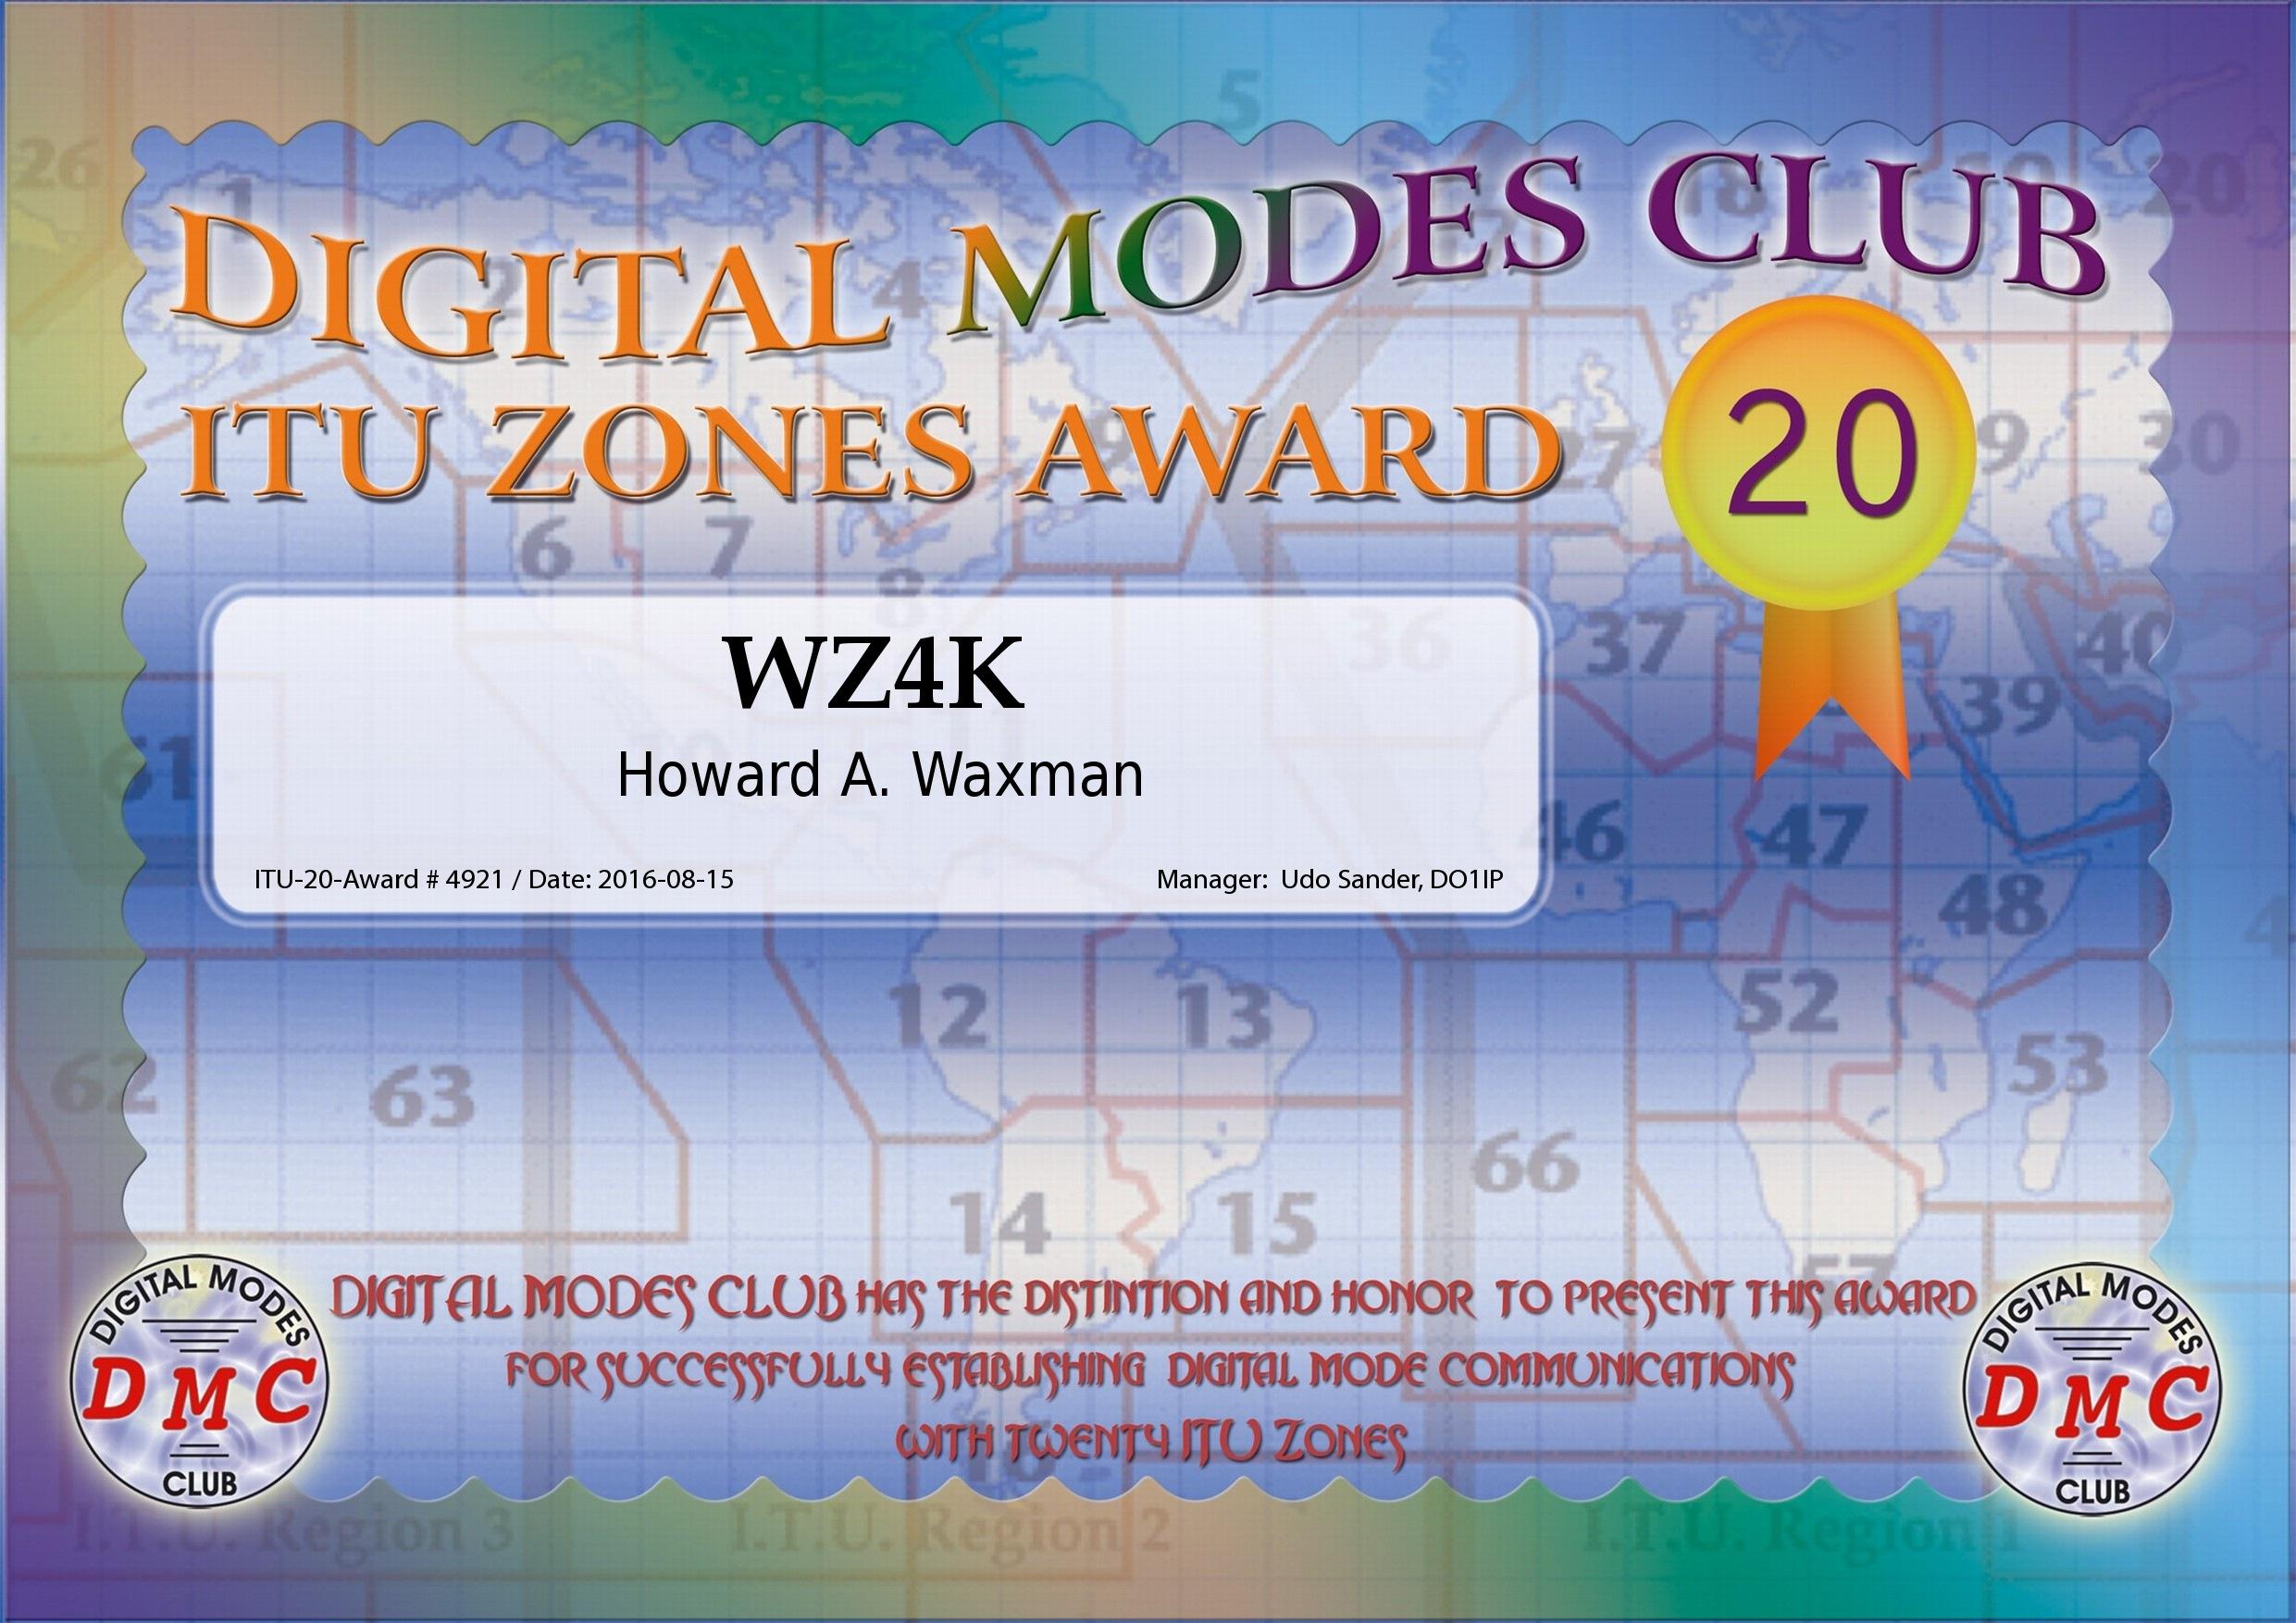 ITU-20-4921-WZ4K